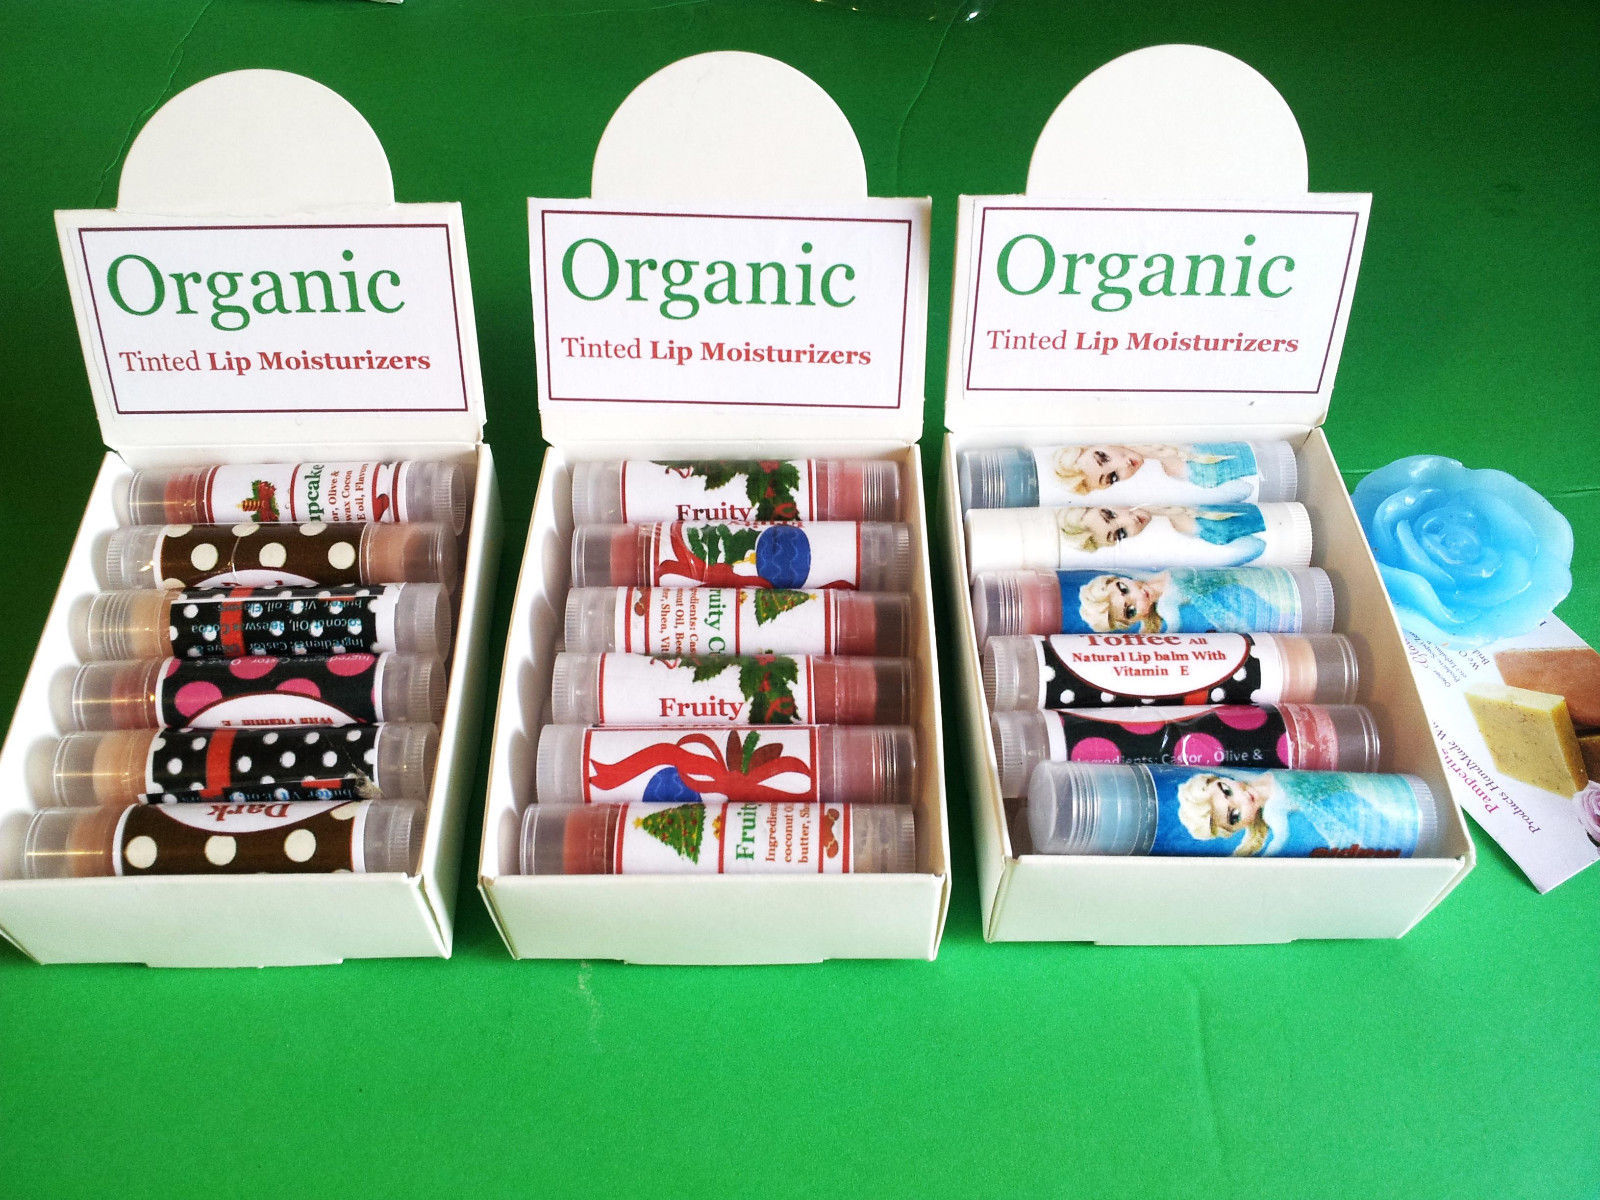 Homemade Handmade Organic Tinted Lip Balm Moisturizer -2Pcs, 5pcs, 10pcs